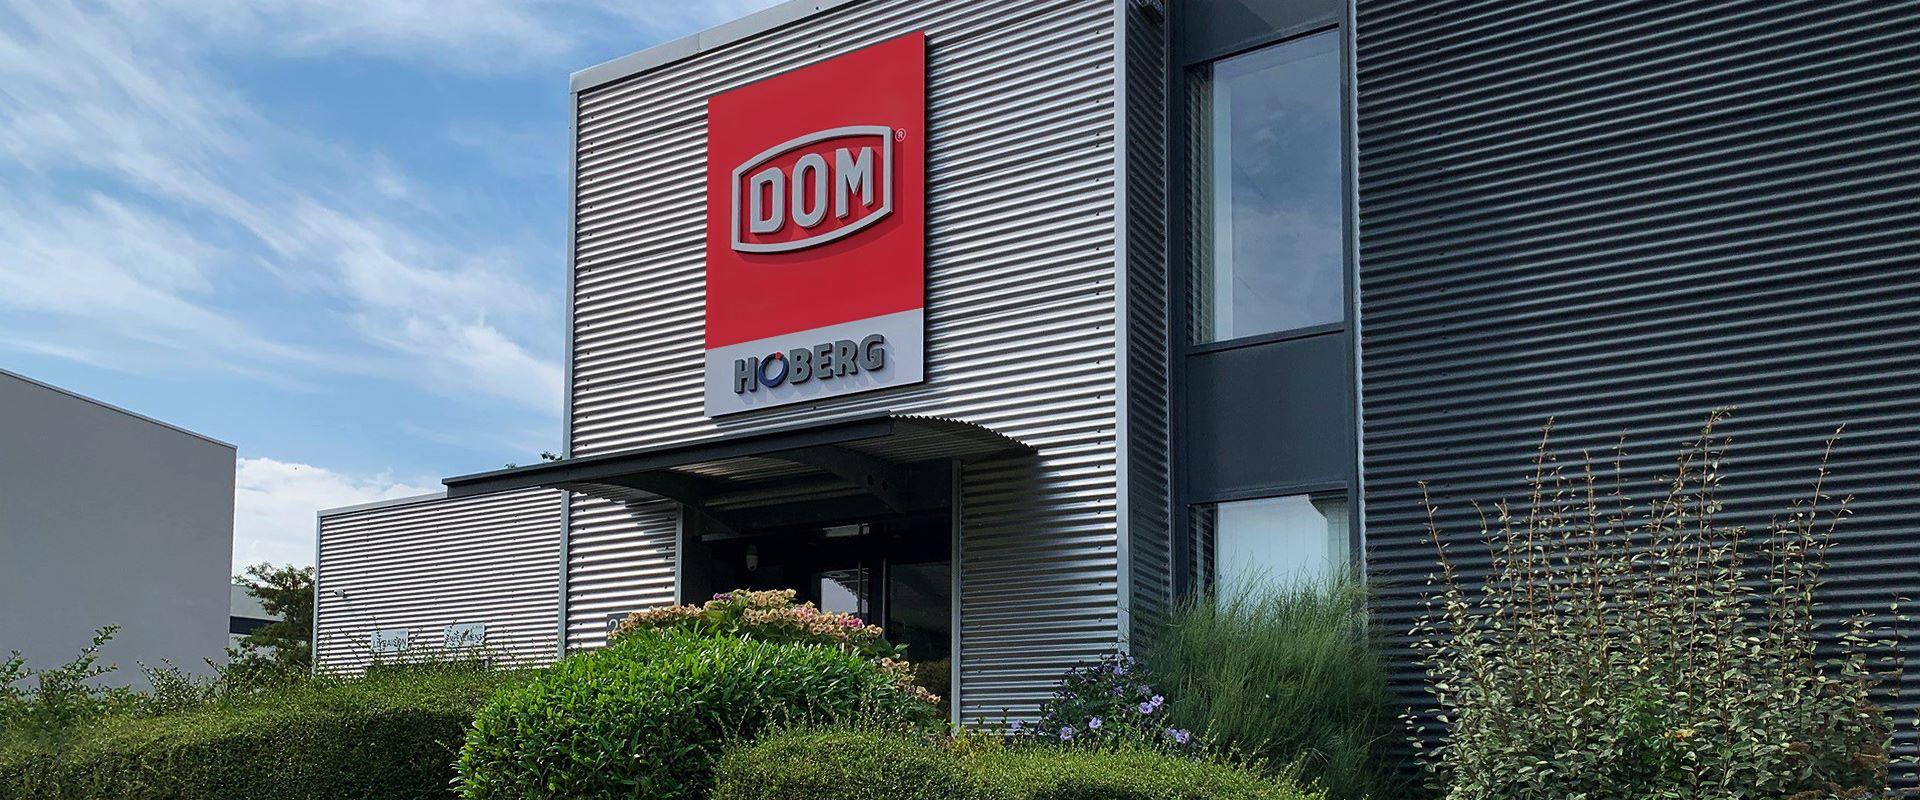 Building DOM HOBERG Wavre